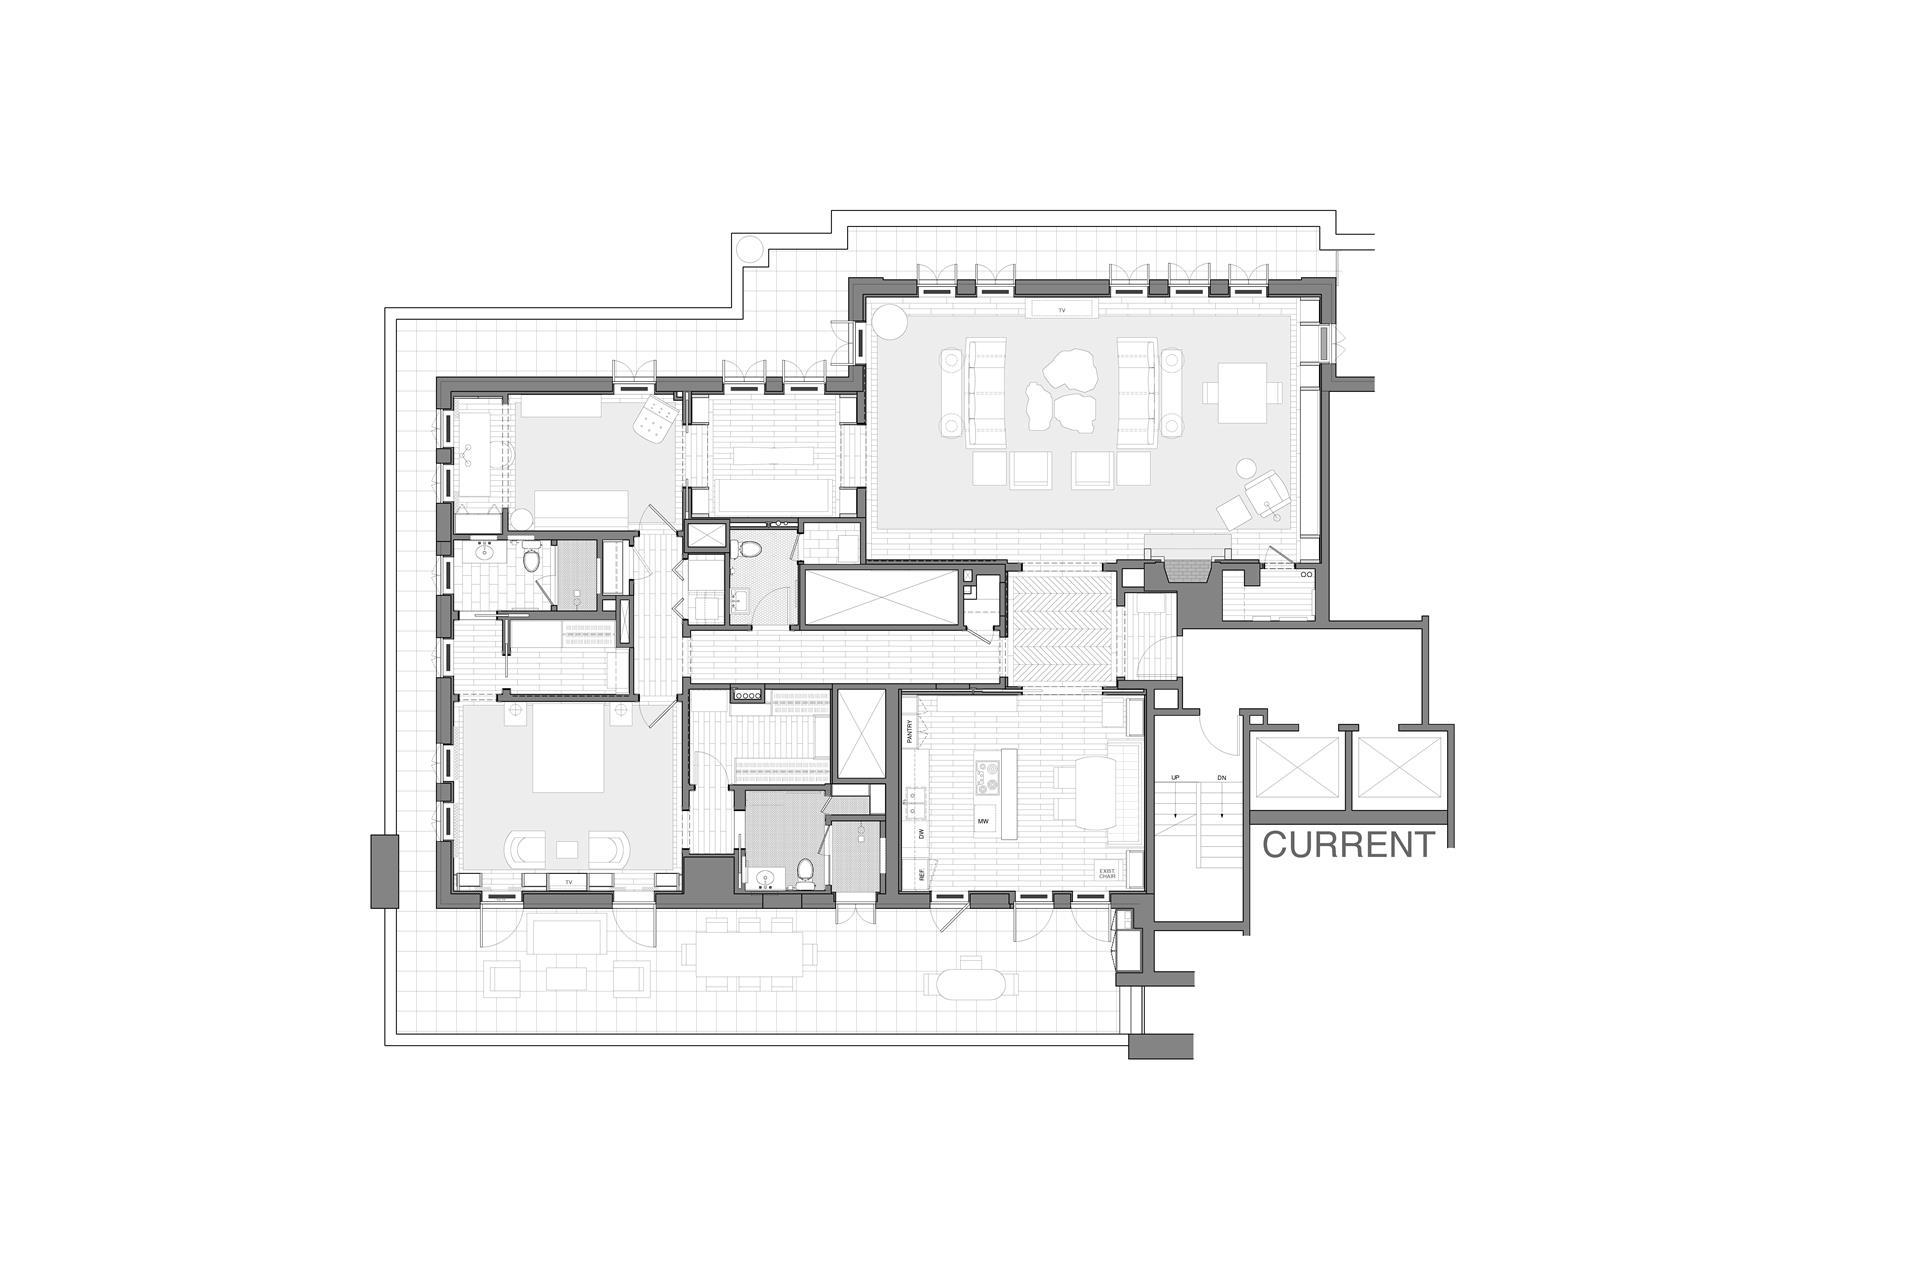 Floor plan of 410 West 24th St, PHA - Chelsea, New York